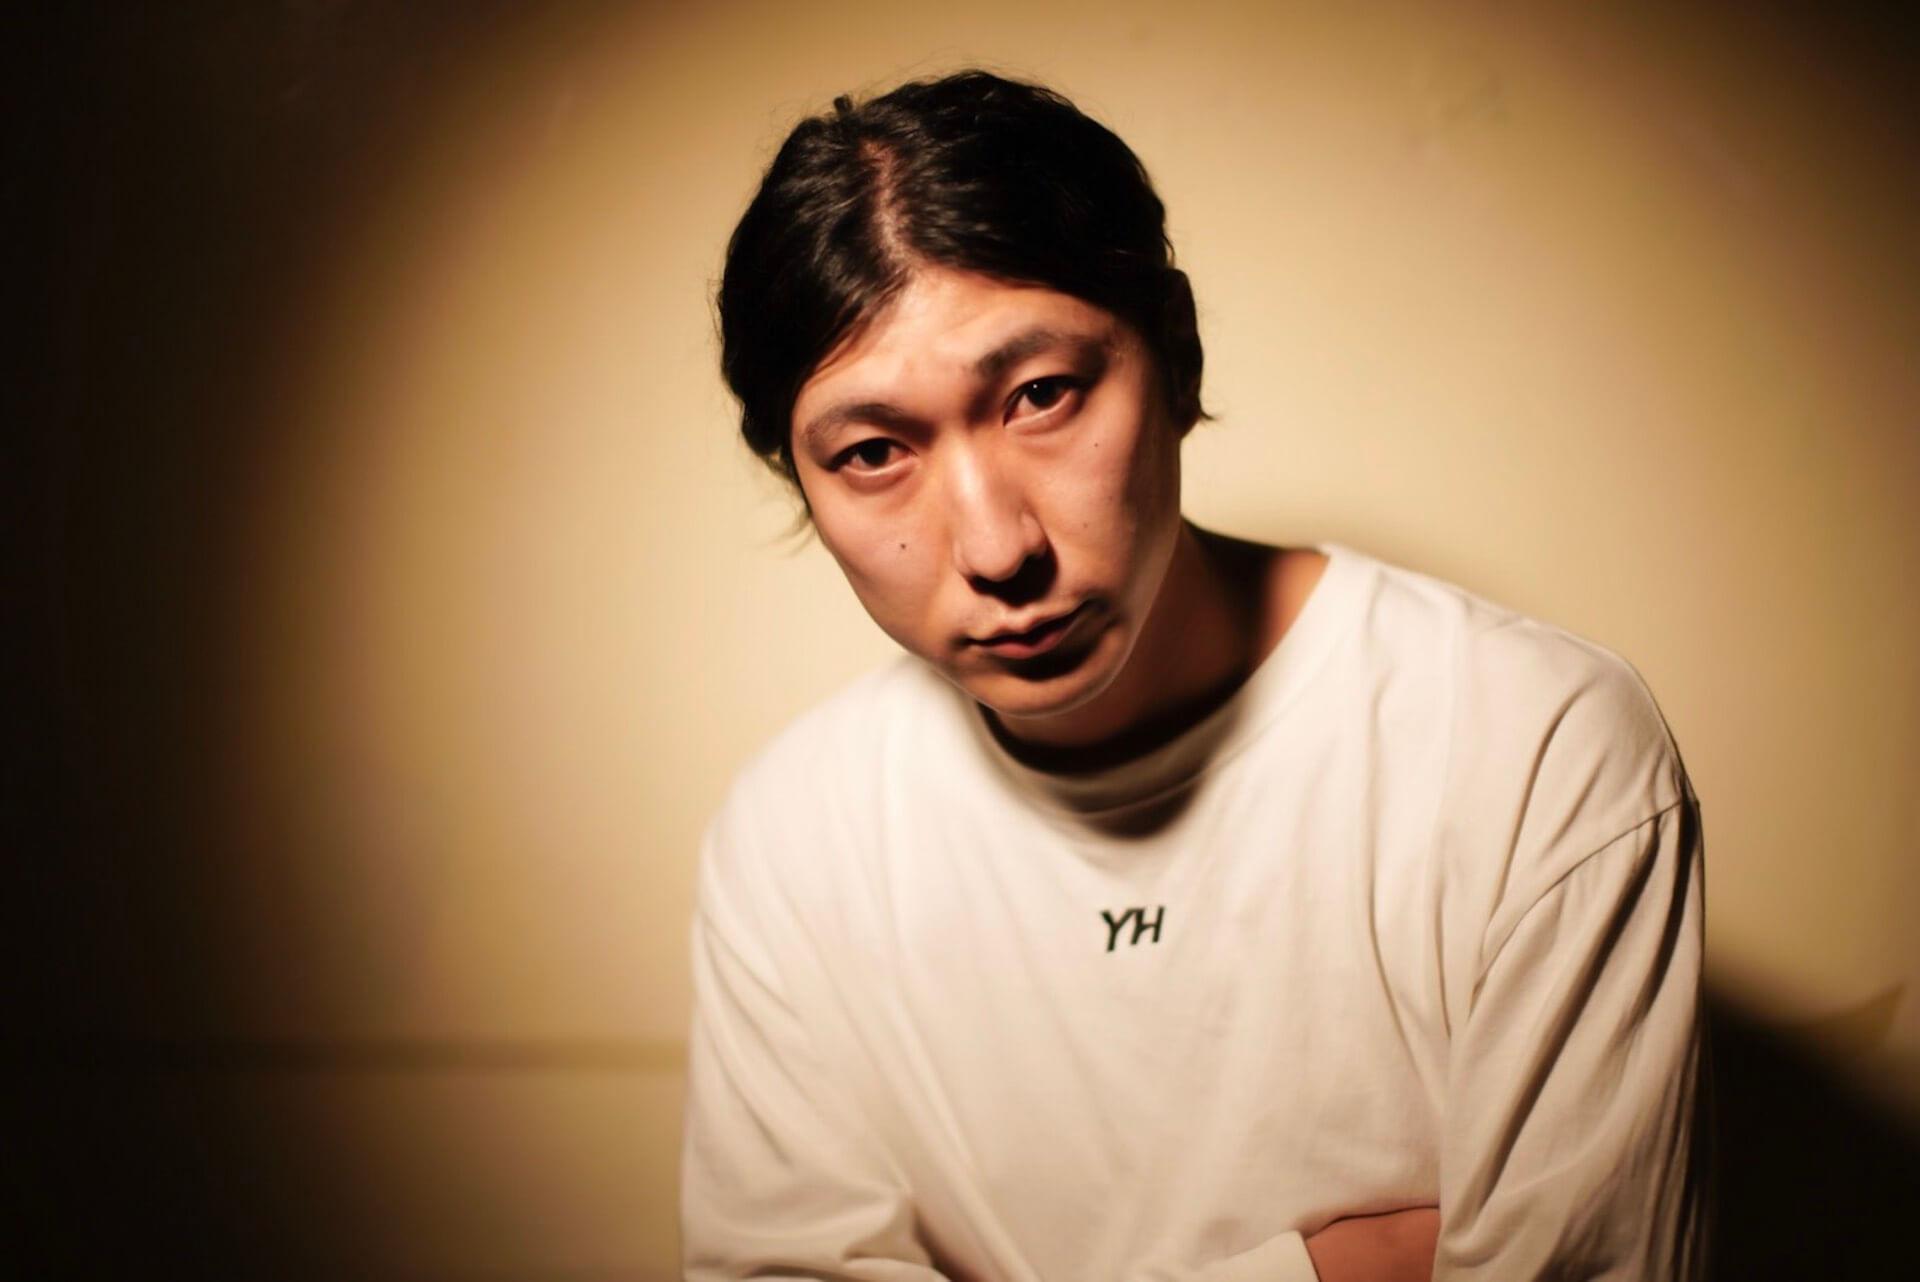 Yoshinori HayashiとDJ TODAYによるレジデントパーティーが美術家・村田峰紀を召喚し11月に開催 music191010-amygdala-moss-3